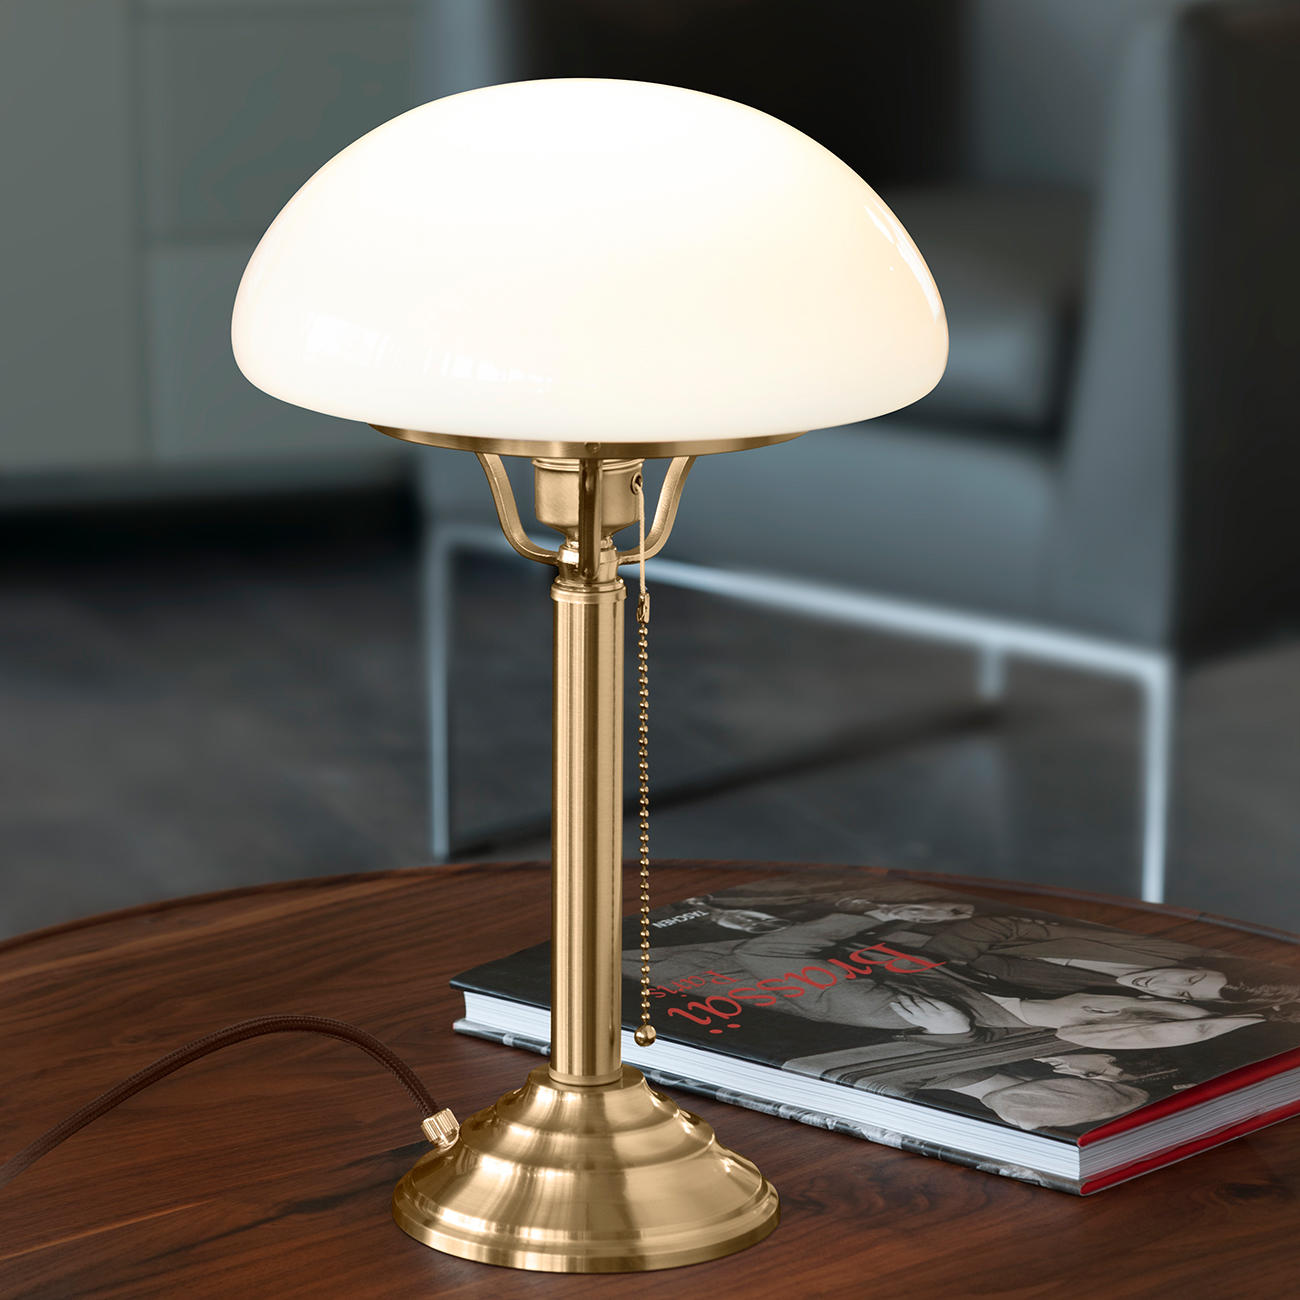 lampe champignon berliner messing pilzlampe pas cher. Black Bedroom Furniture Sets. Home Design Ideas